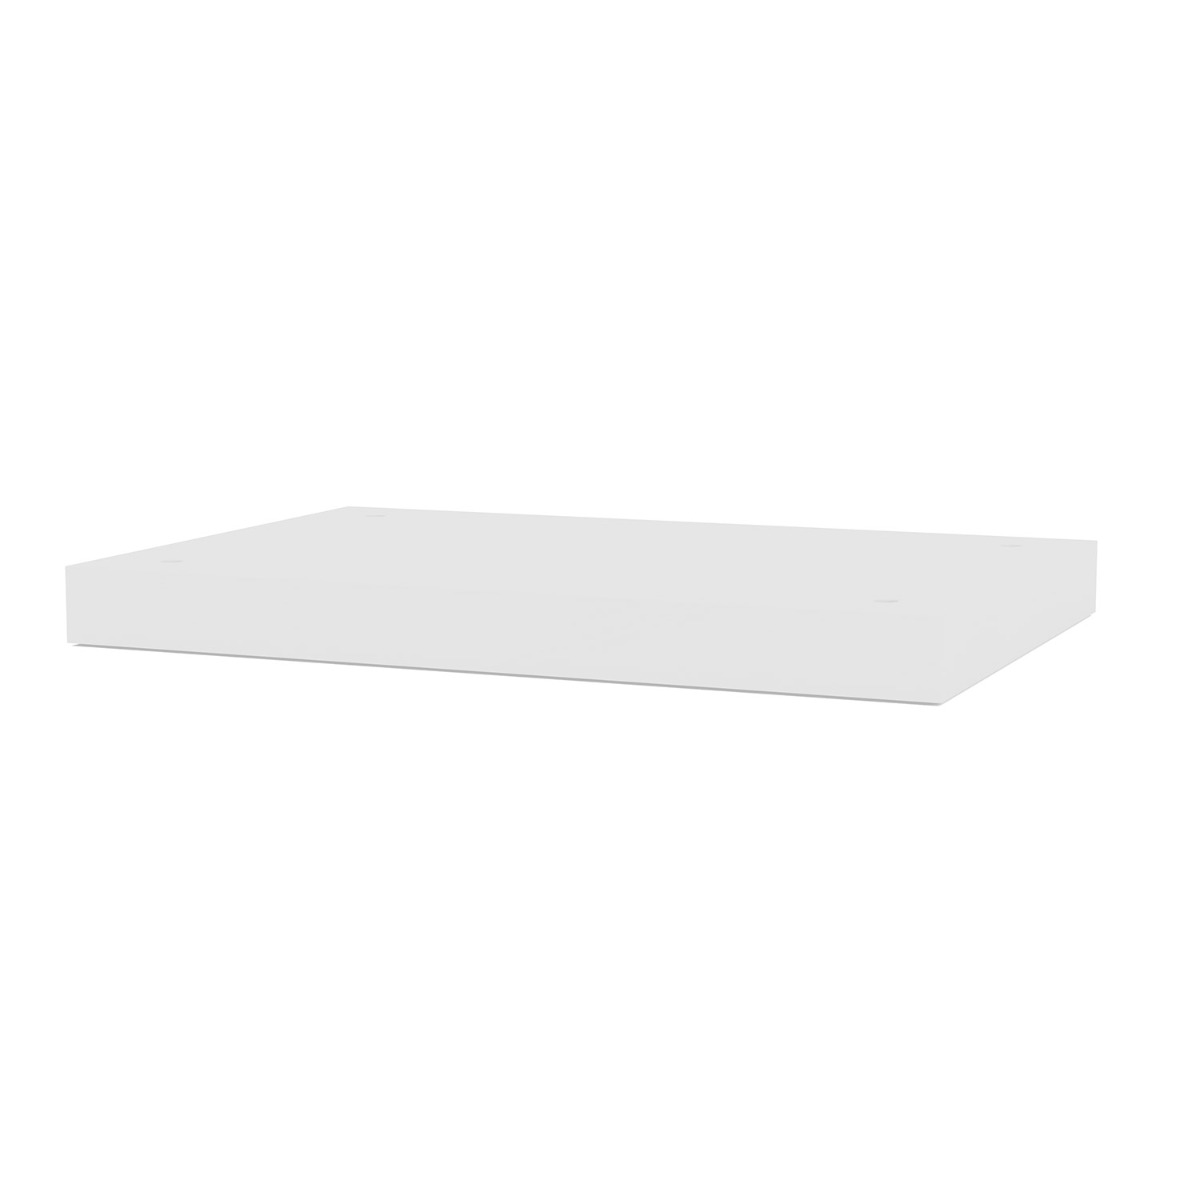 Montana Modul Mini sockel 35x25 cm New White